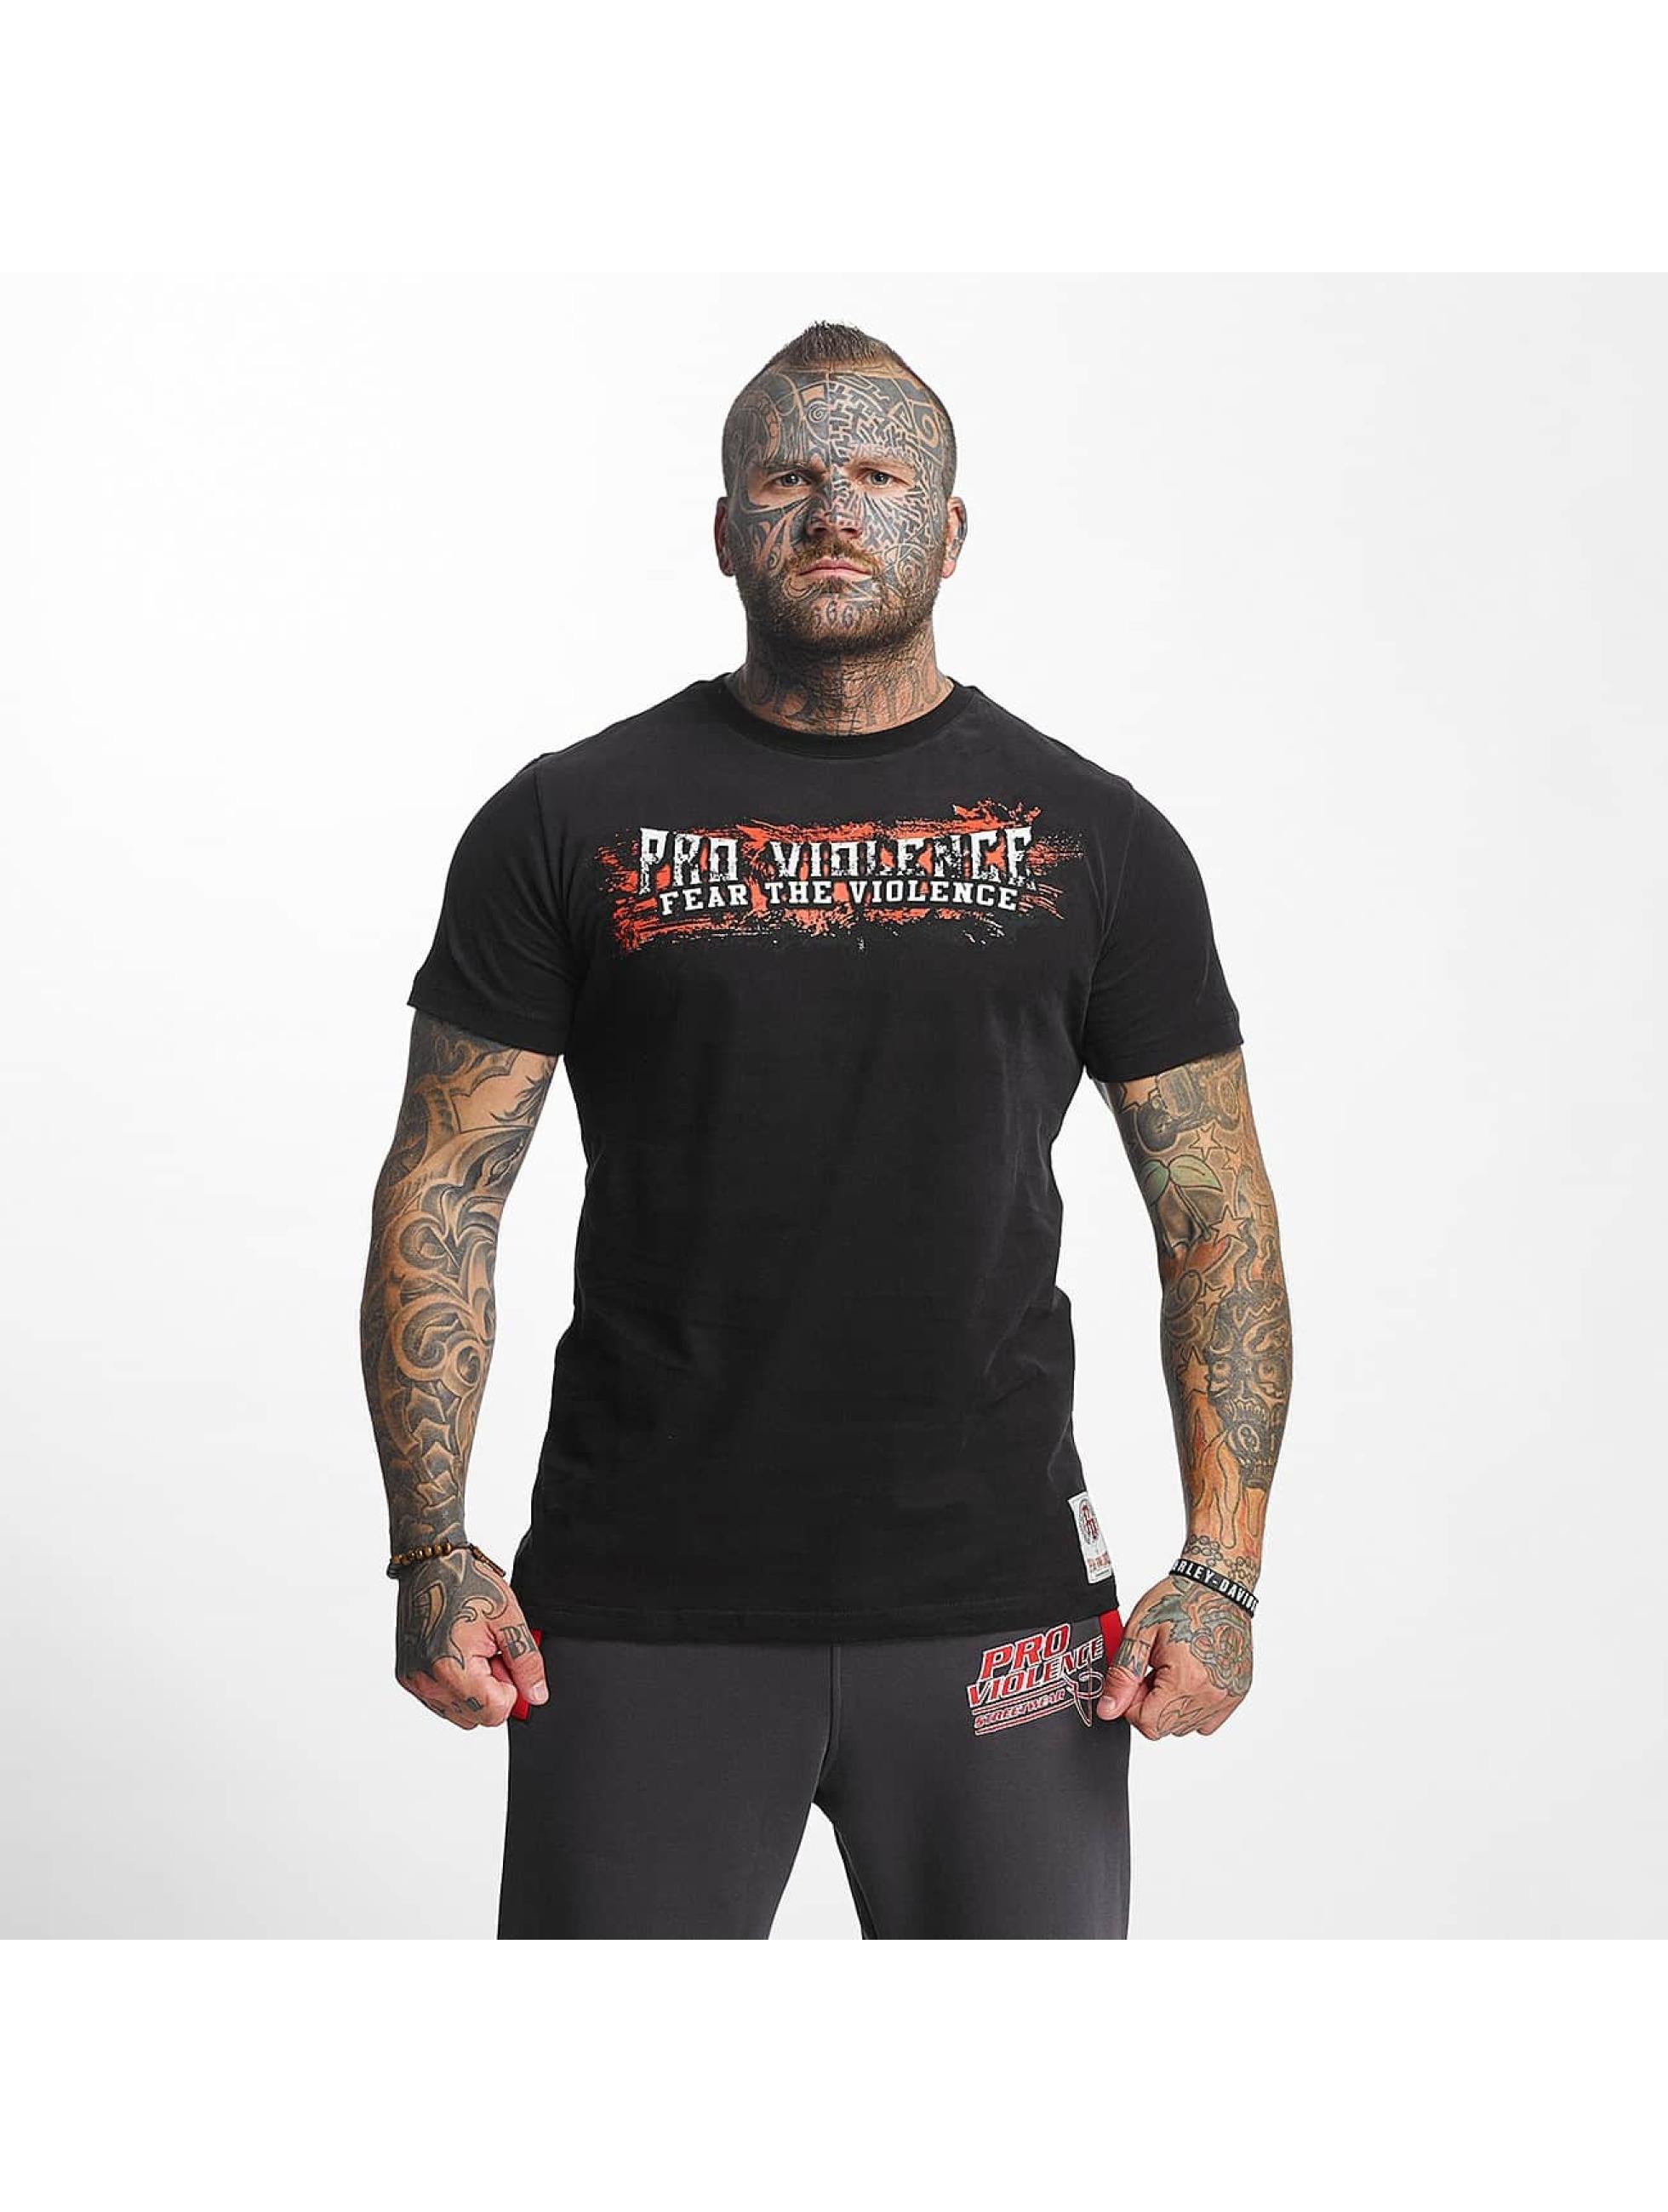 Pro Violence Streetwear T-Shirt The Violence Fear noir